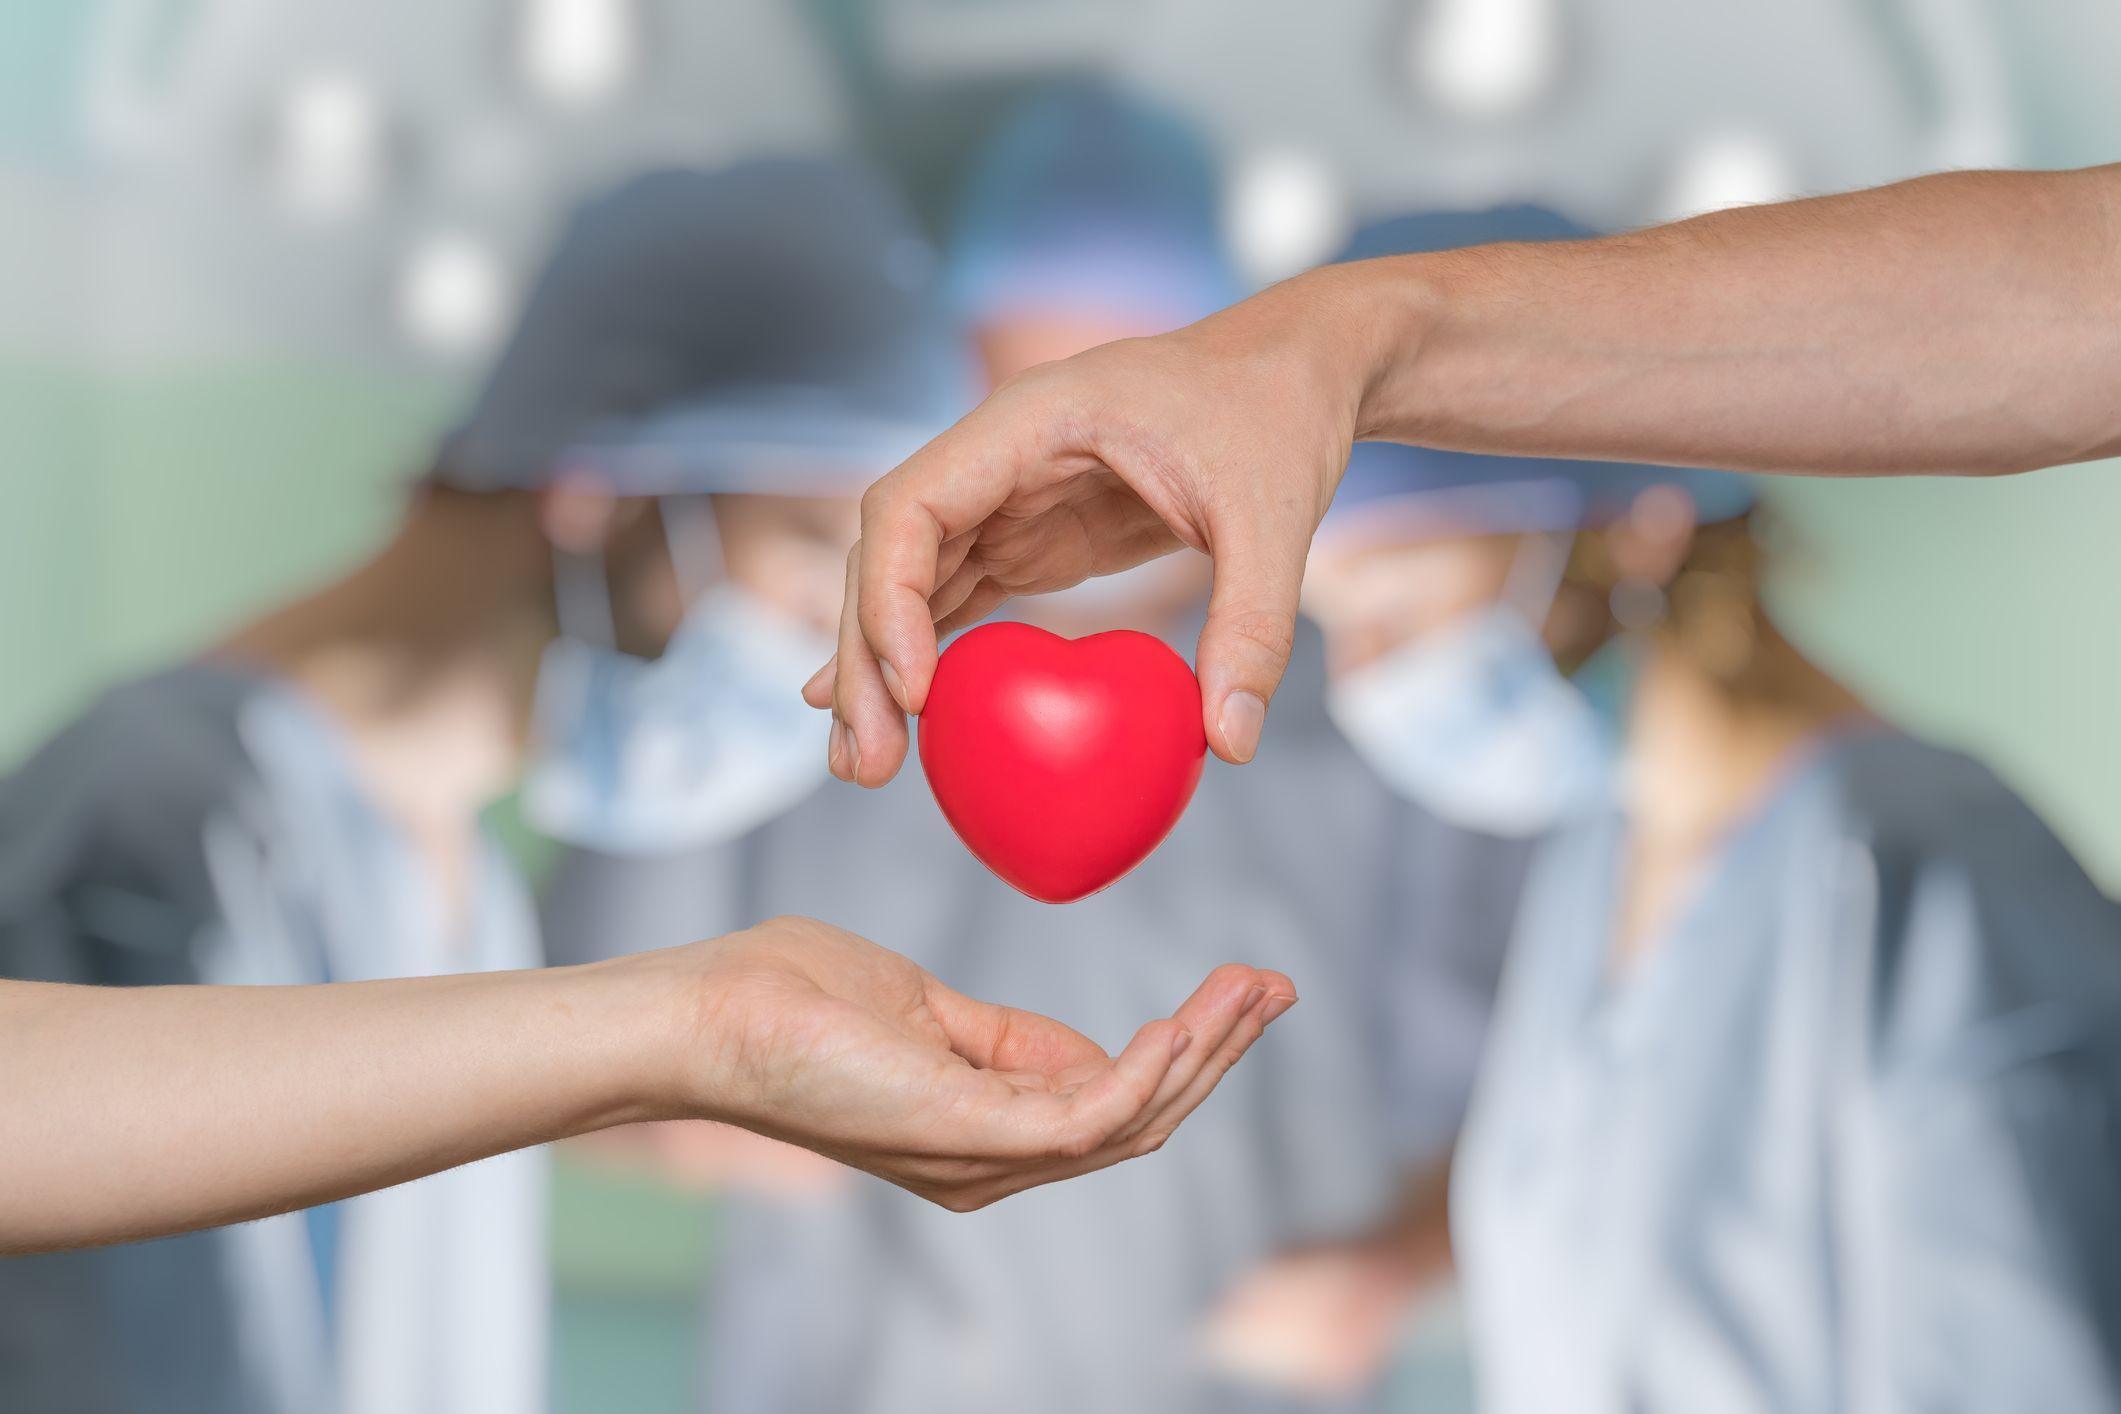 heart-transplant-stock